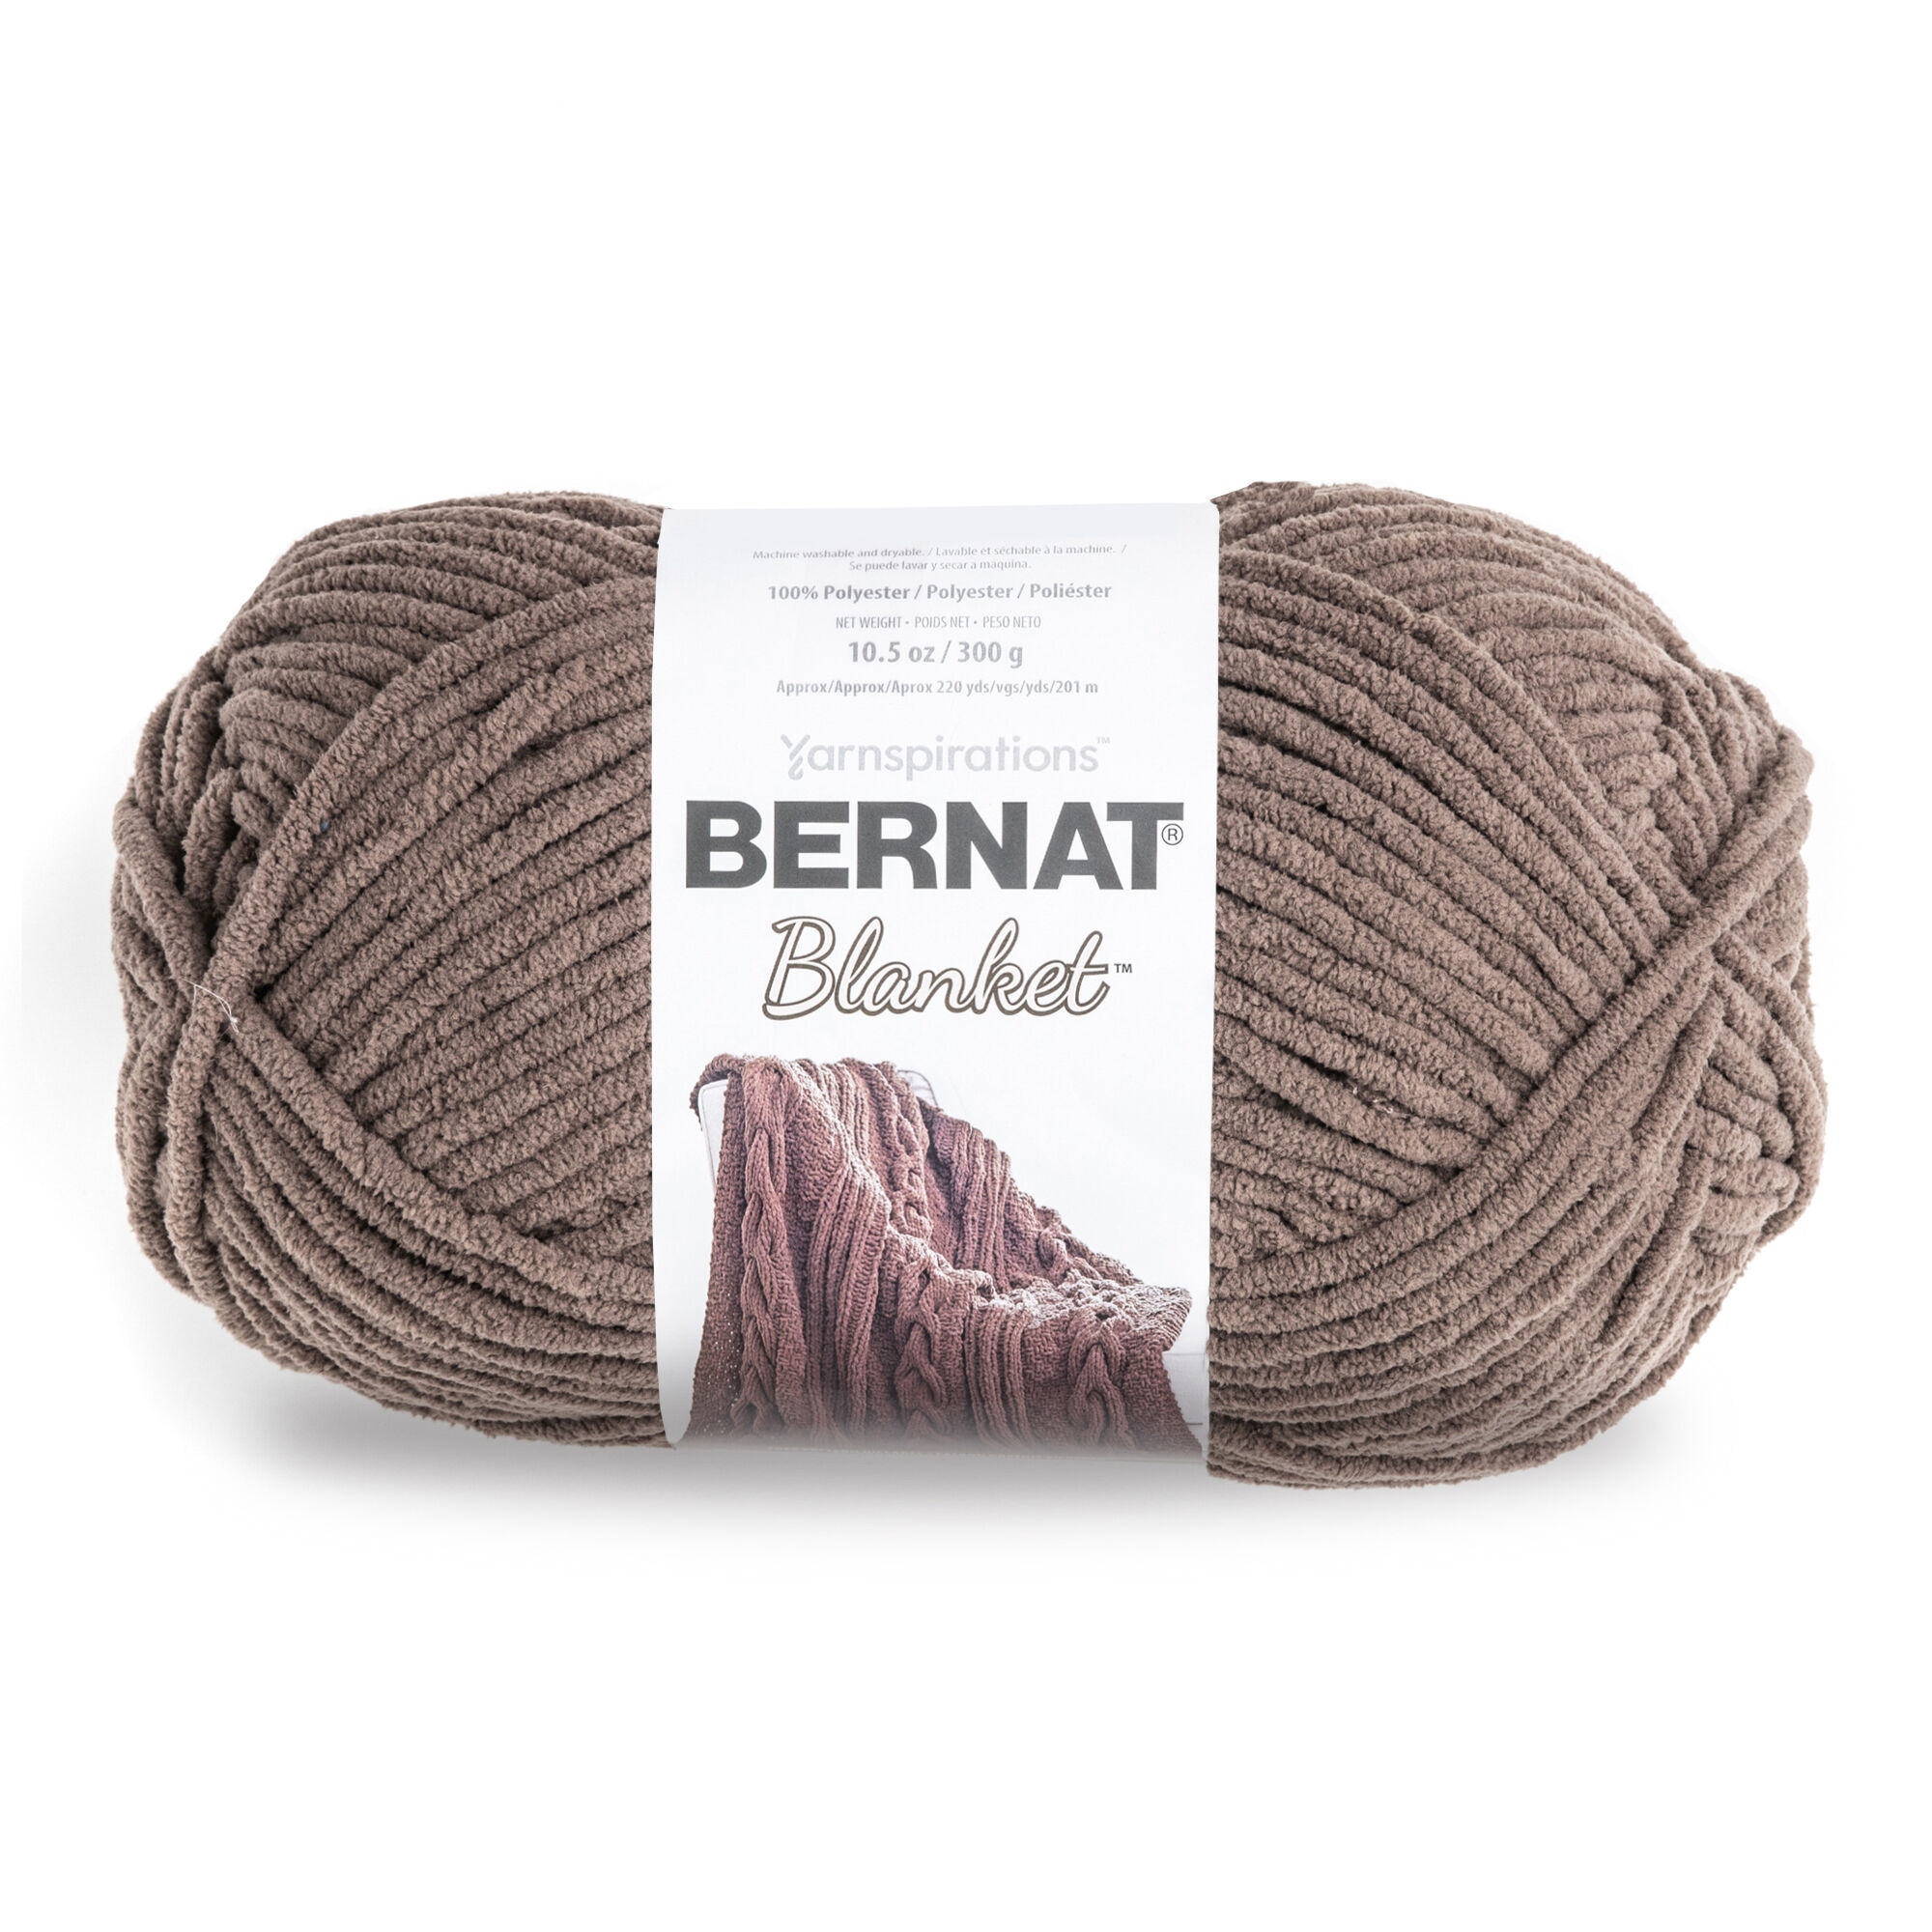 Bernat Blanket Big Ball Yarn-Orchid Dusk